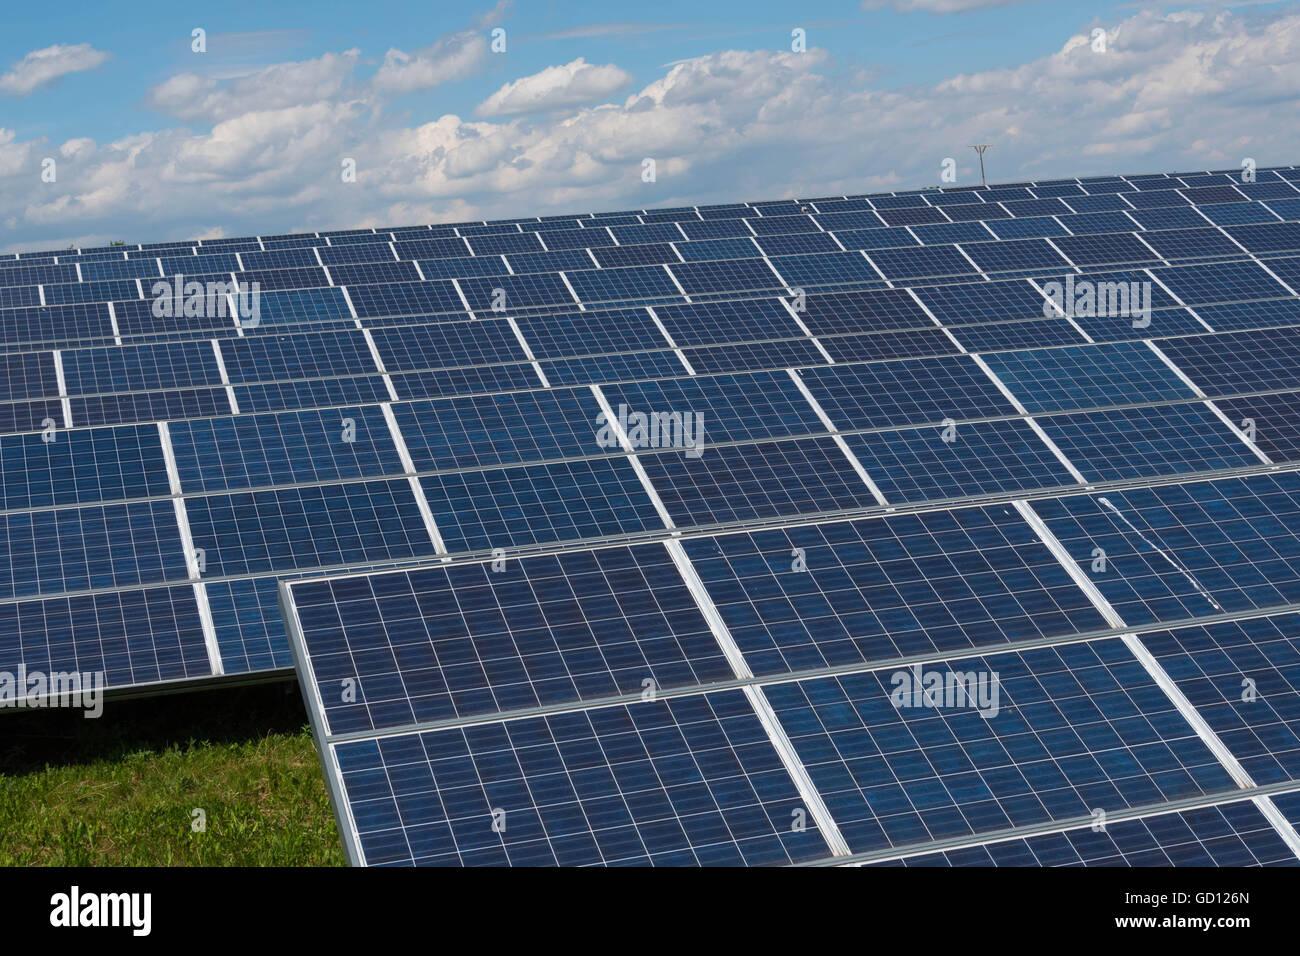 Solar power plant - Photovoltaic panels - renewable energie - Stock Image